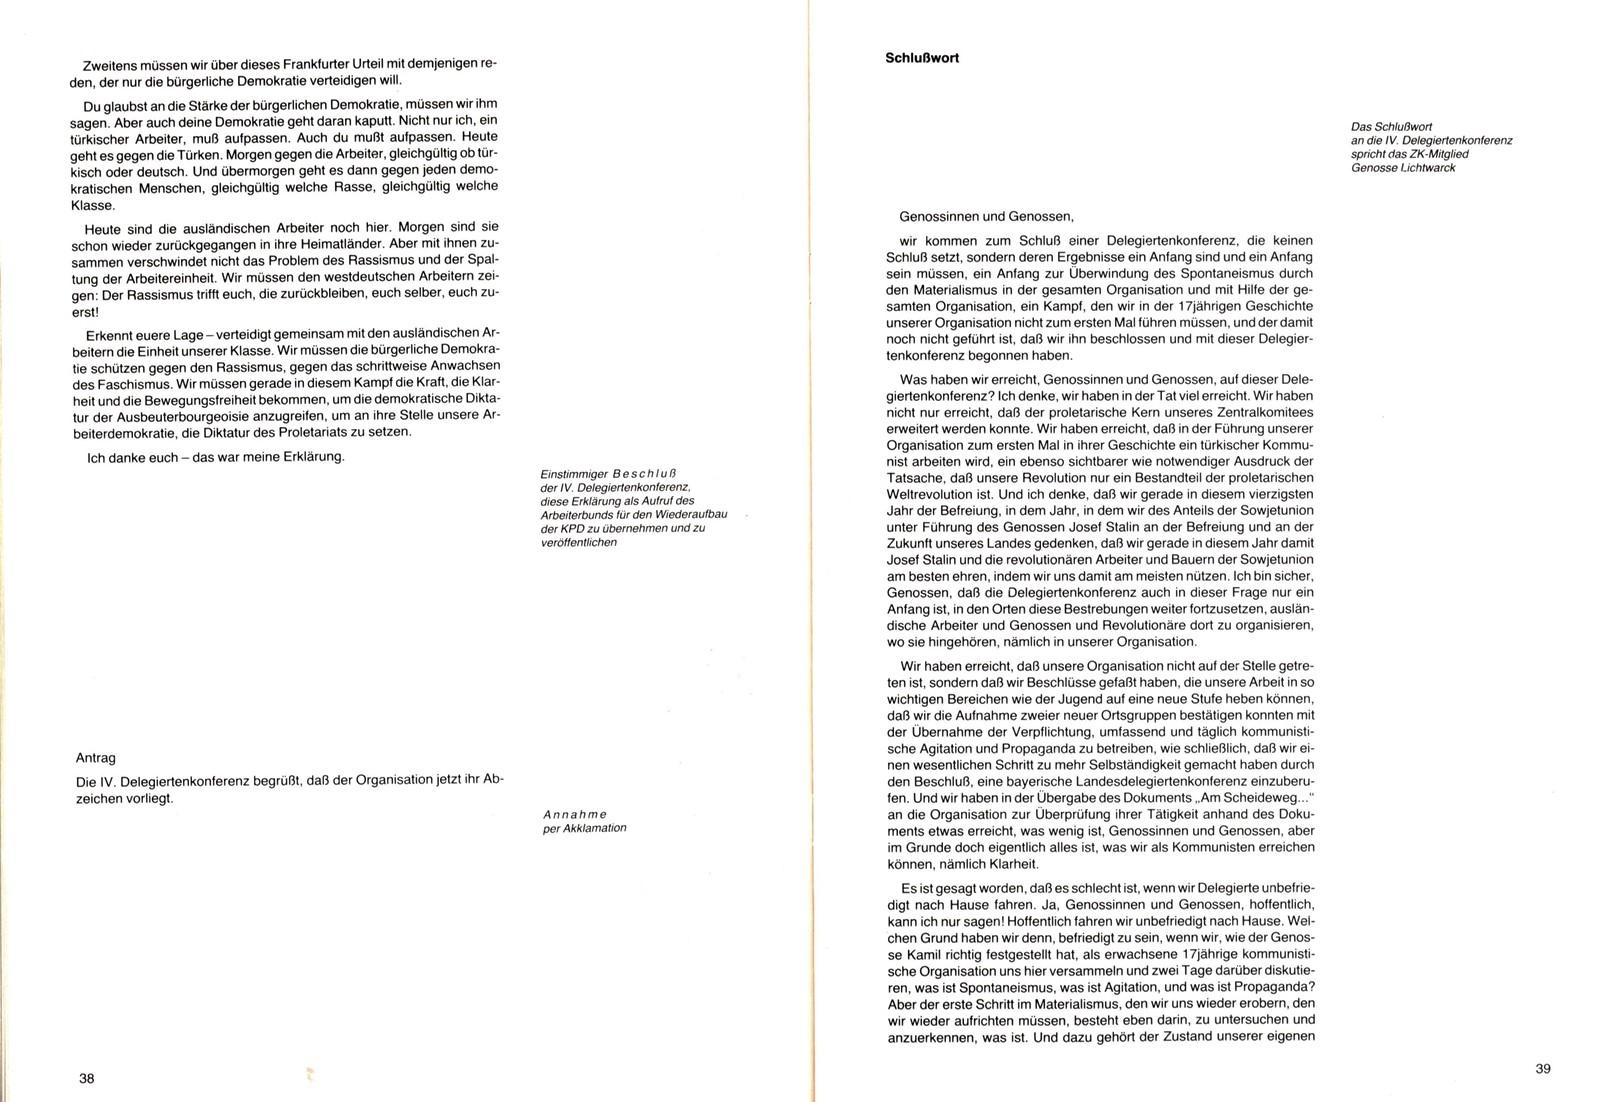 ABG_1985_Beschluesse_IV_Delegiertenkonferenz_21